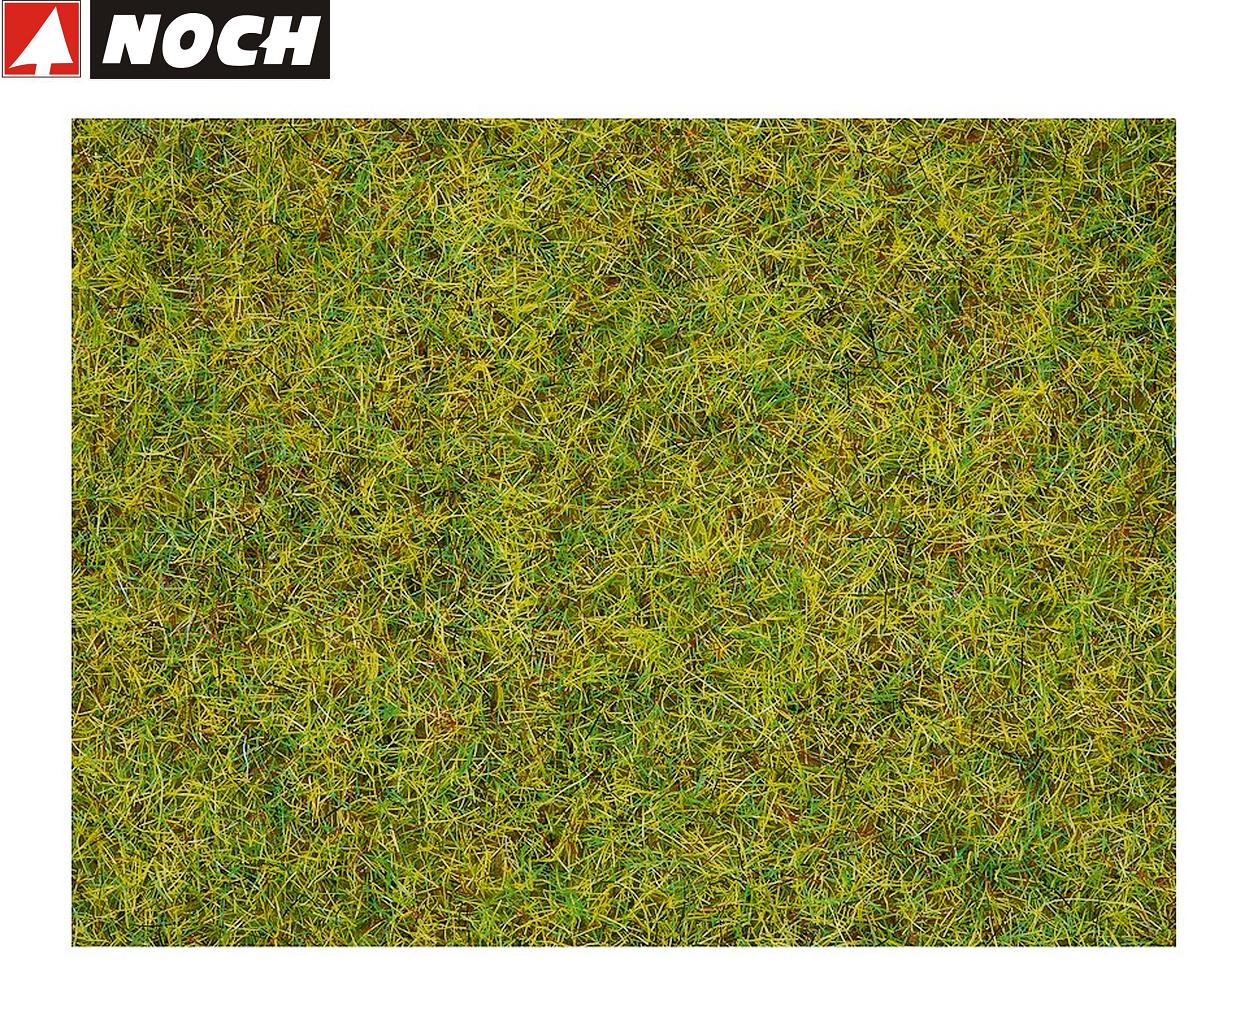 2,5 mm  20 g Beutel Neu OVP Noch 08310 H0-N Streugras Sommerwiese